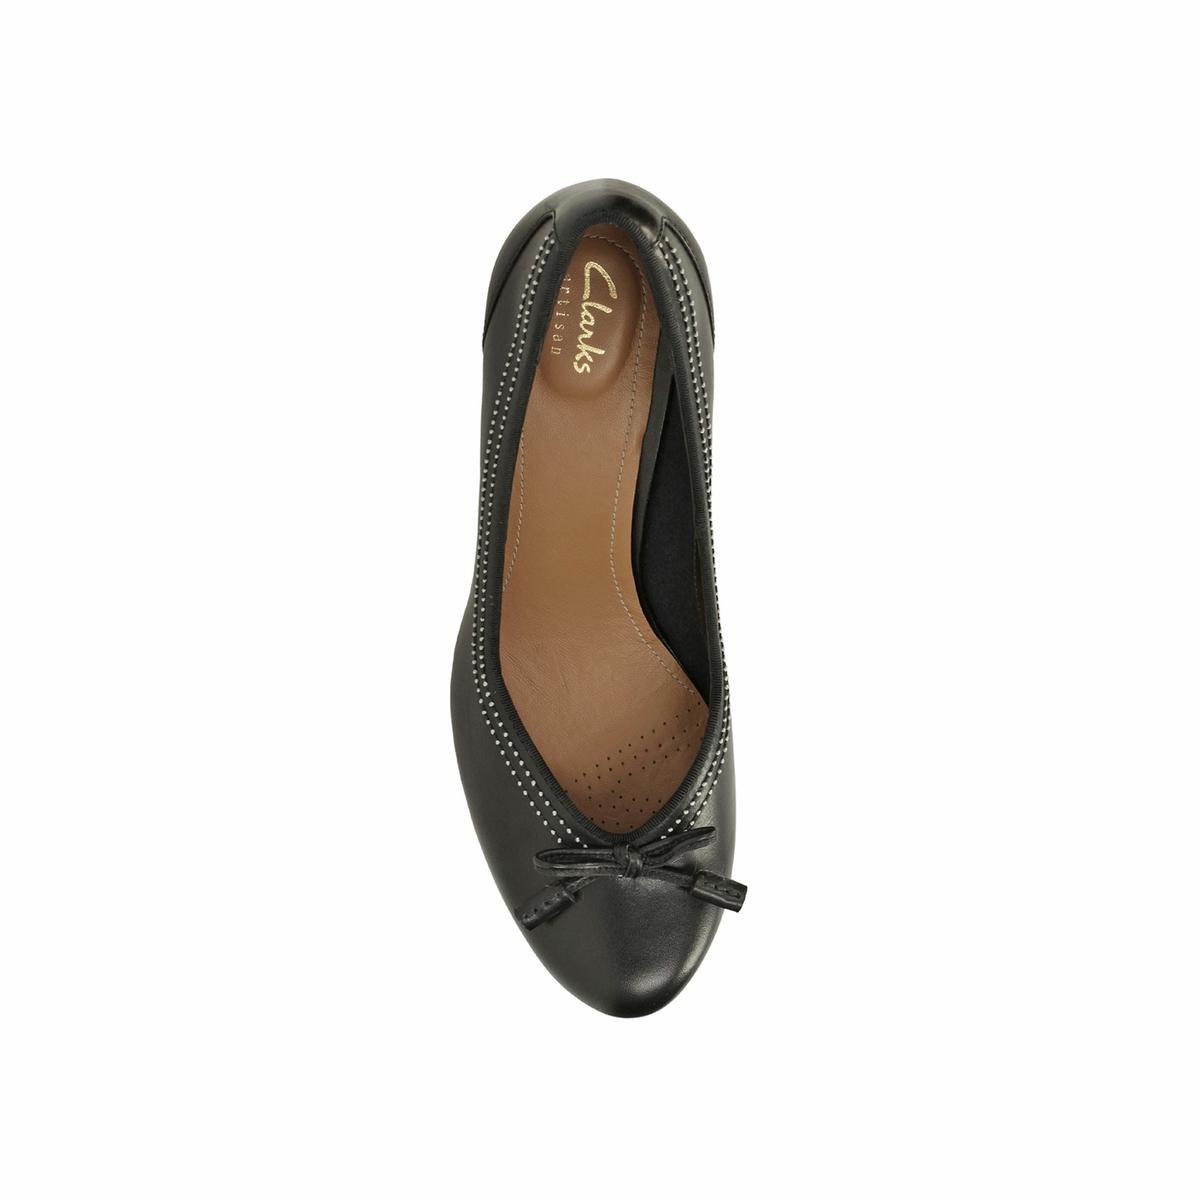 Imagen secundaria de producto de Zapatos de tacón, de piel, Chorus Bombay - Clarks